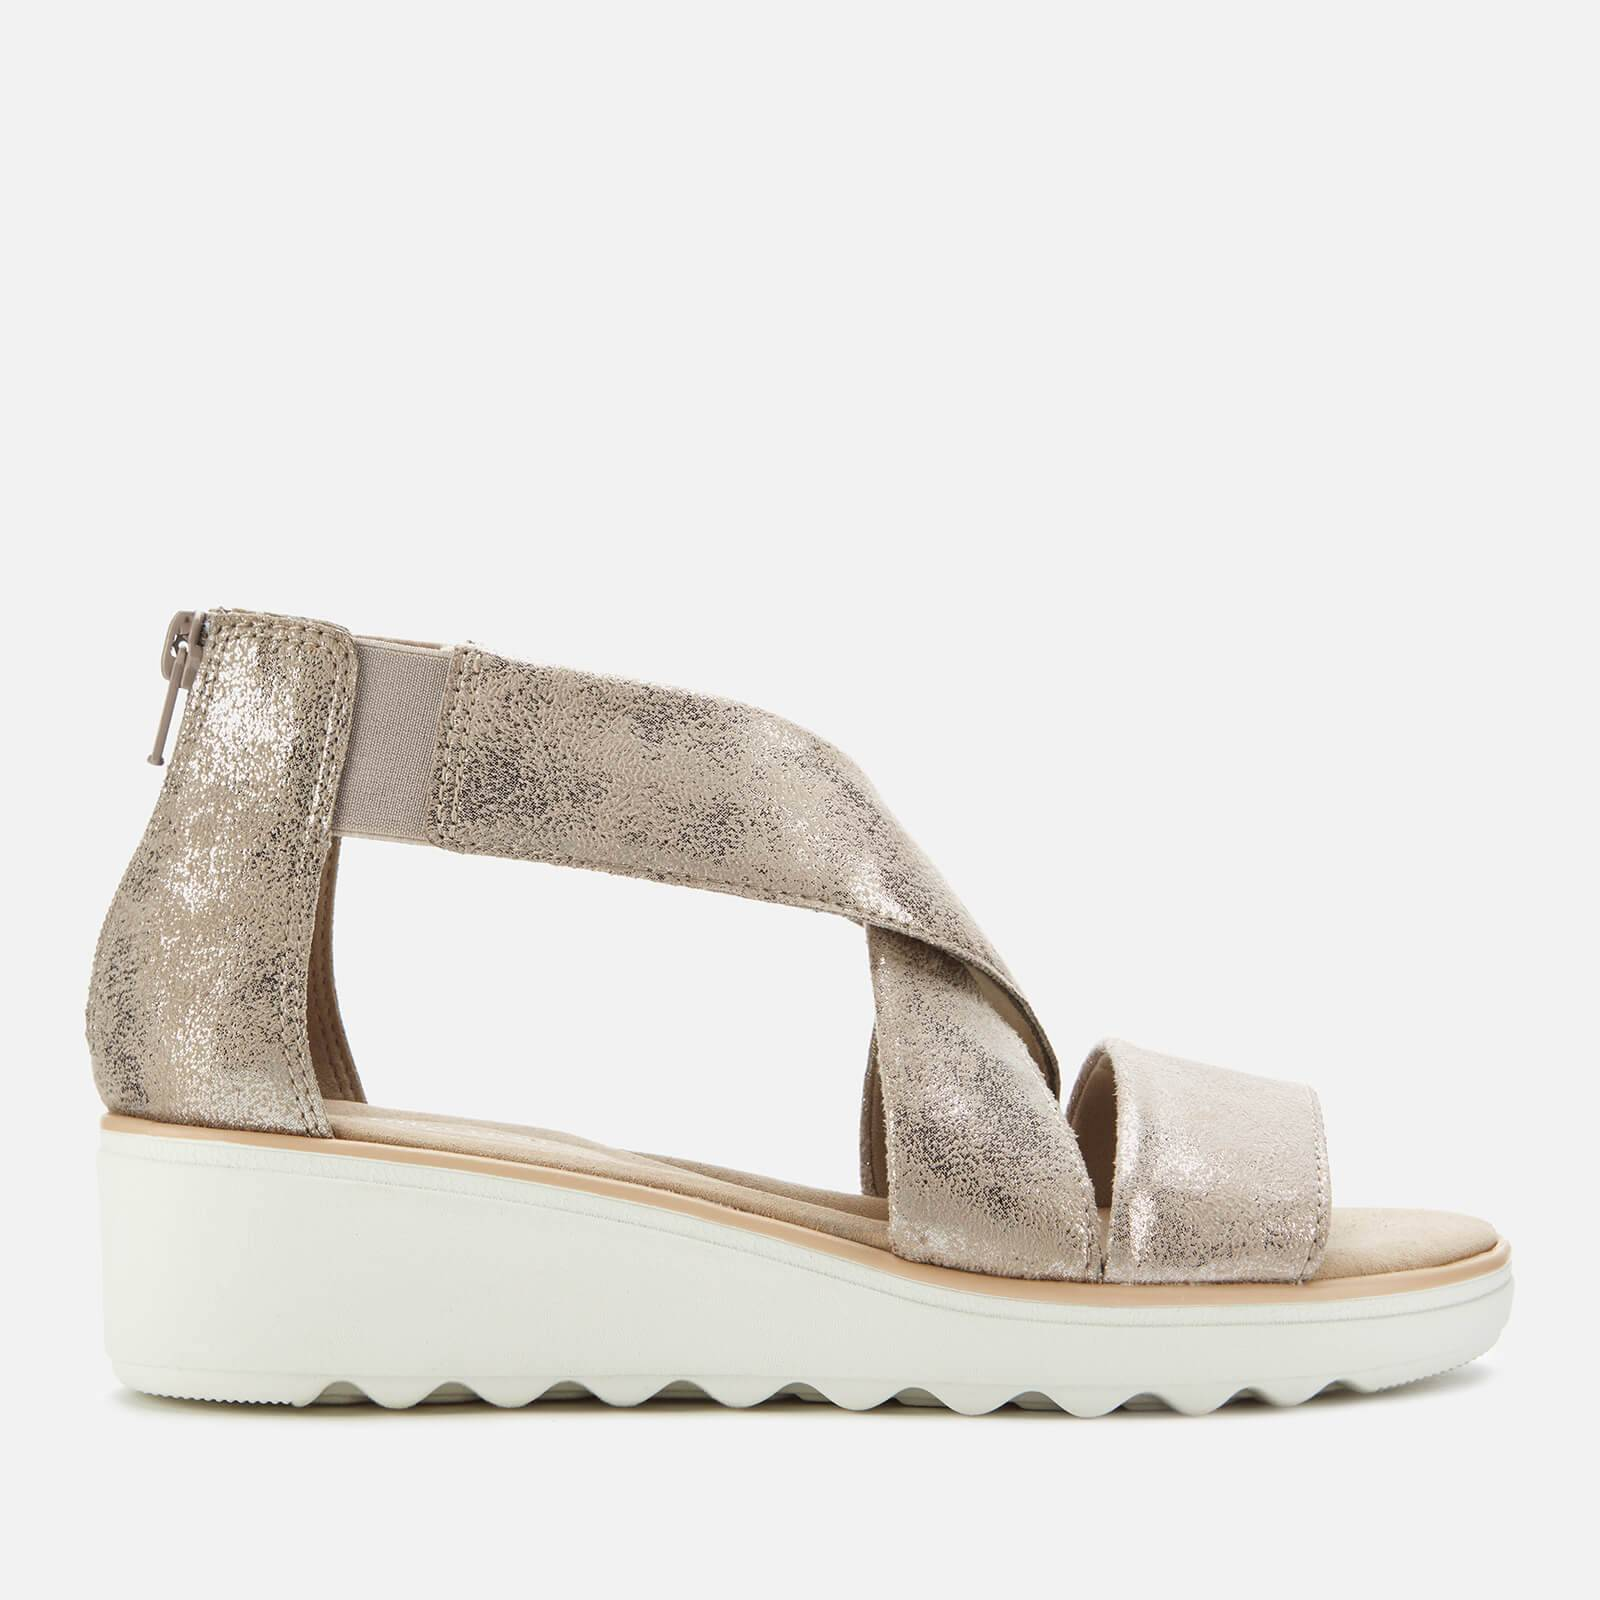 Clarks Women's Jillian Rise Wedged Sandals - Pewter - UK 7